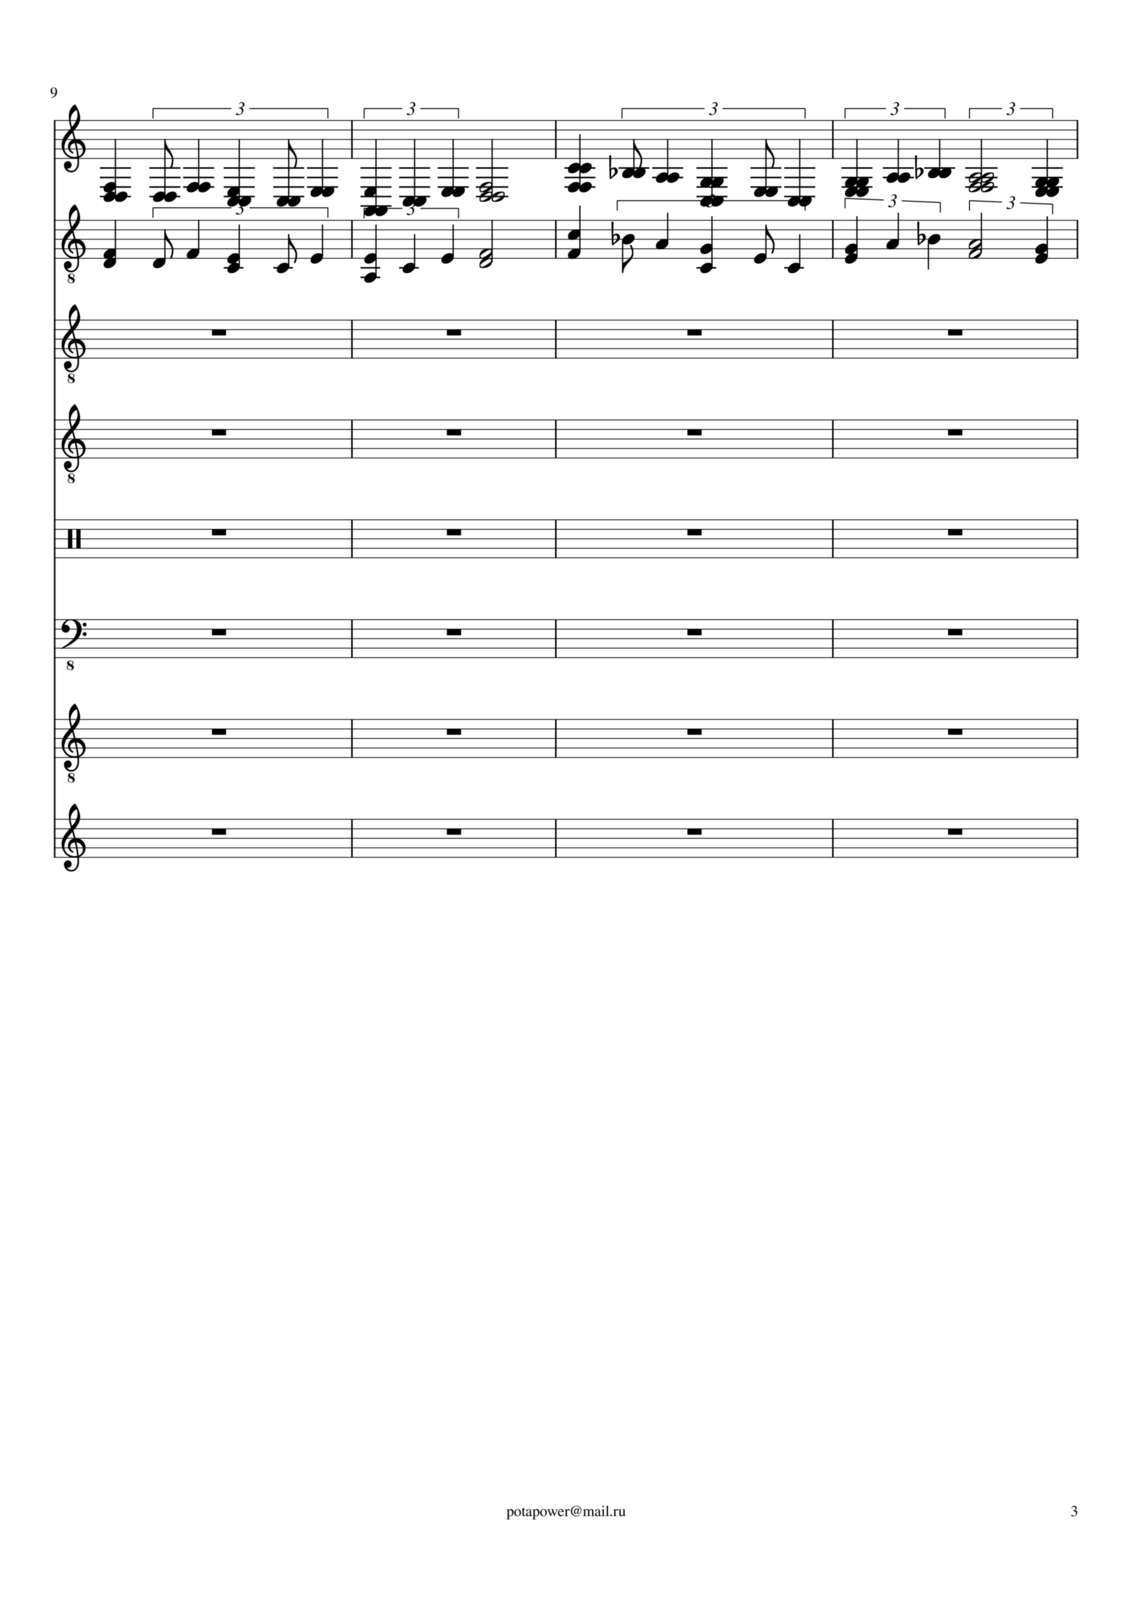 Korolevstvo slez slide, Image 3